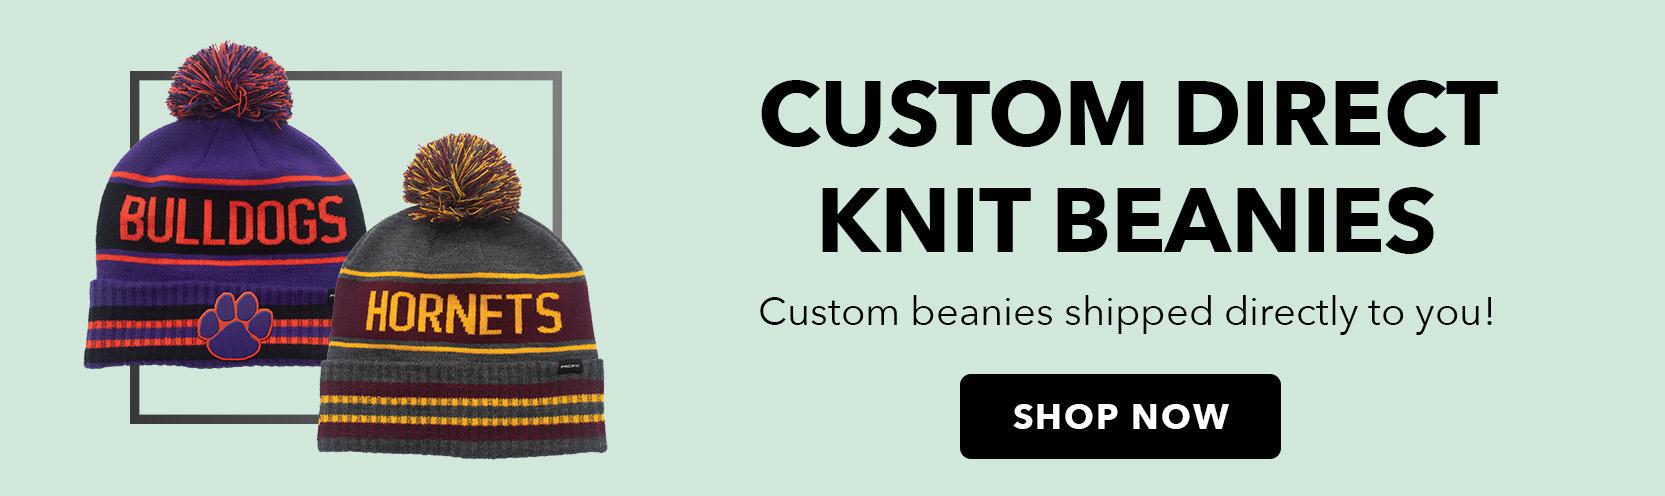 Custom Direct Knit Beanies